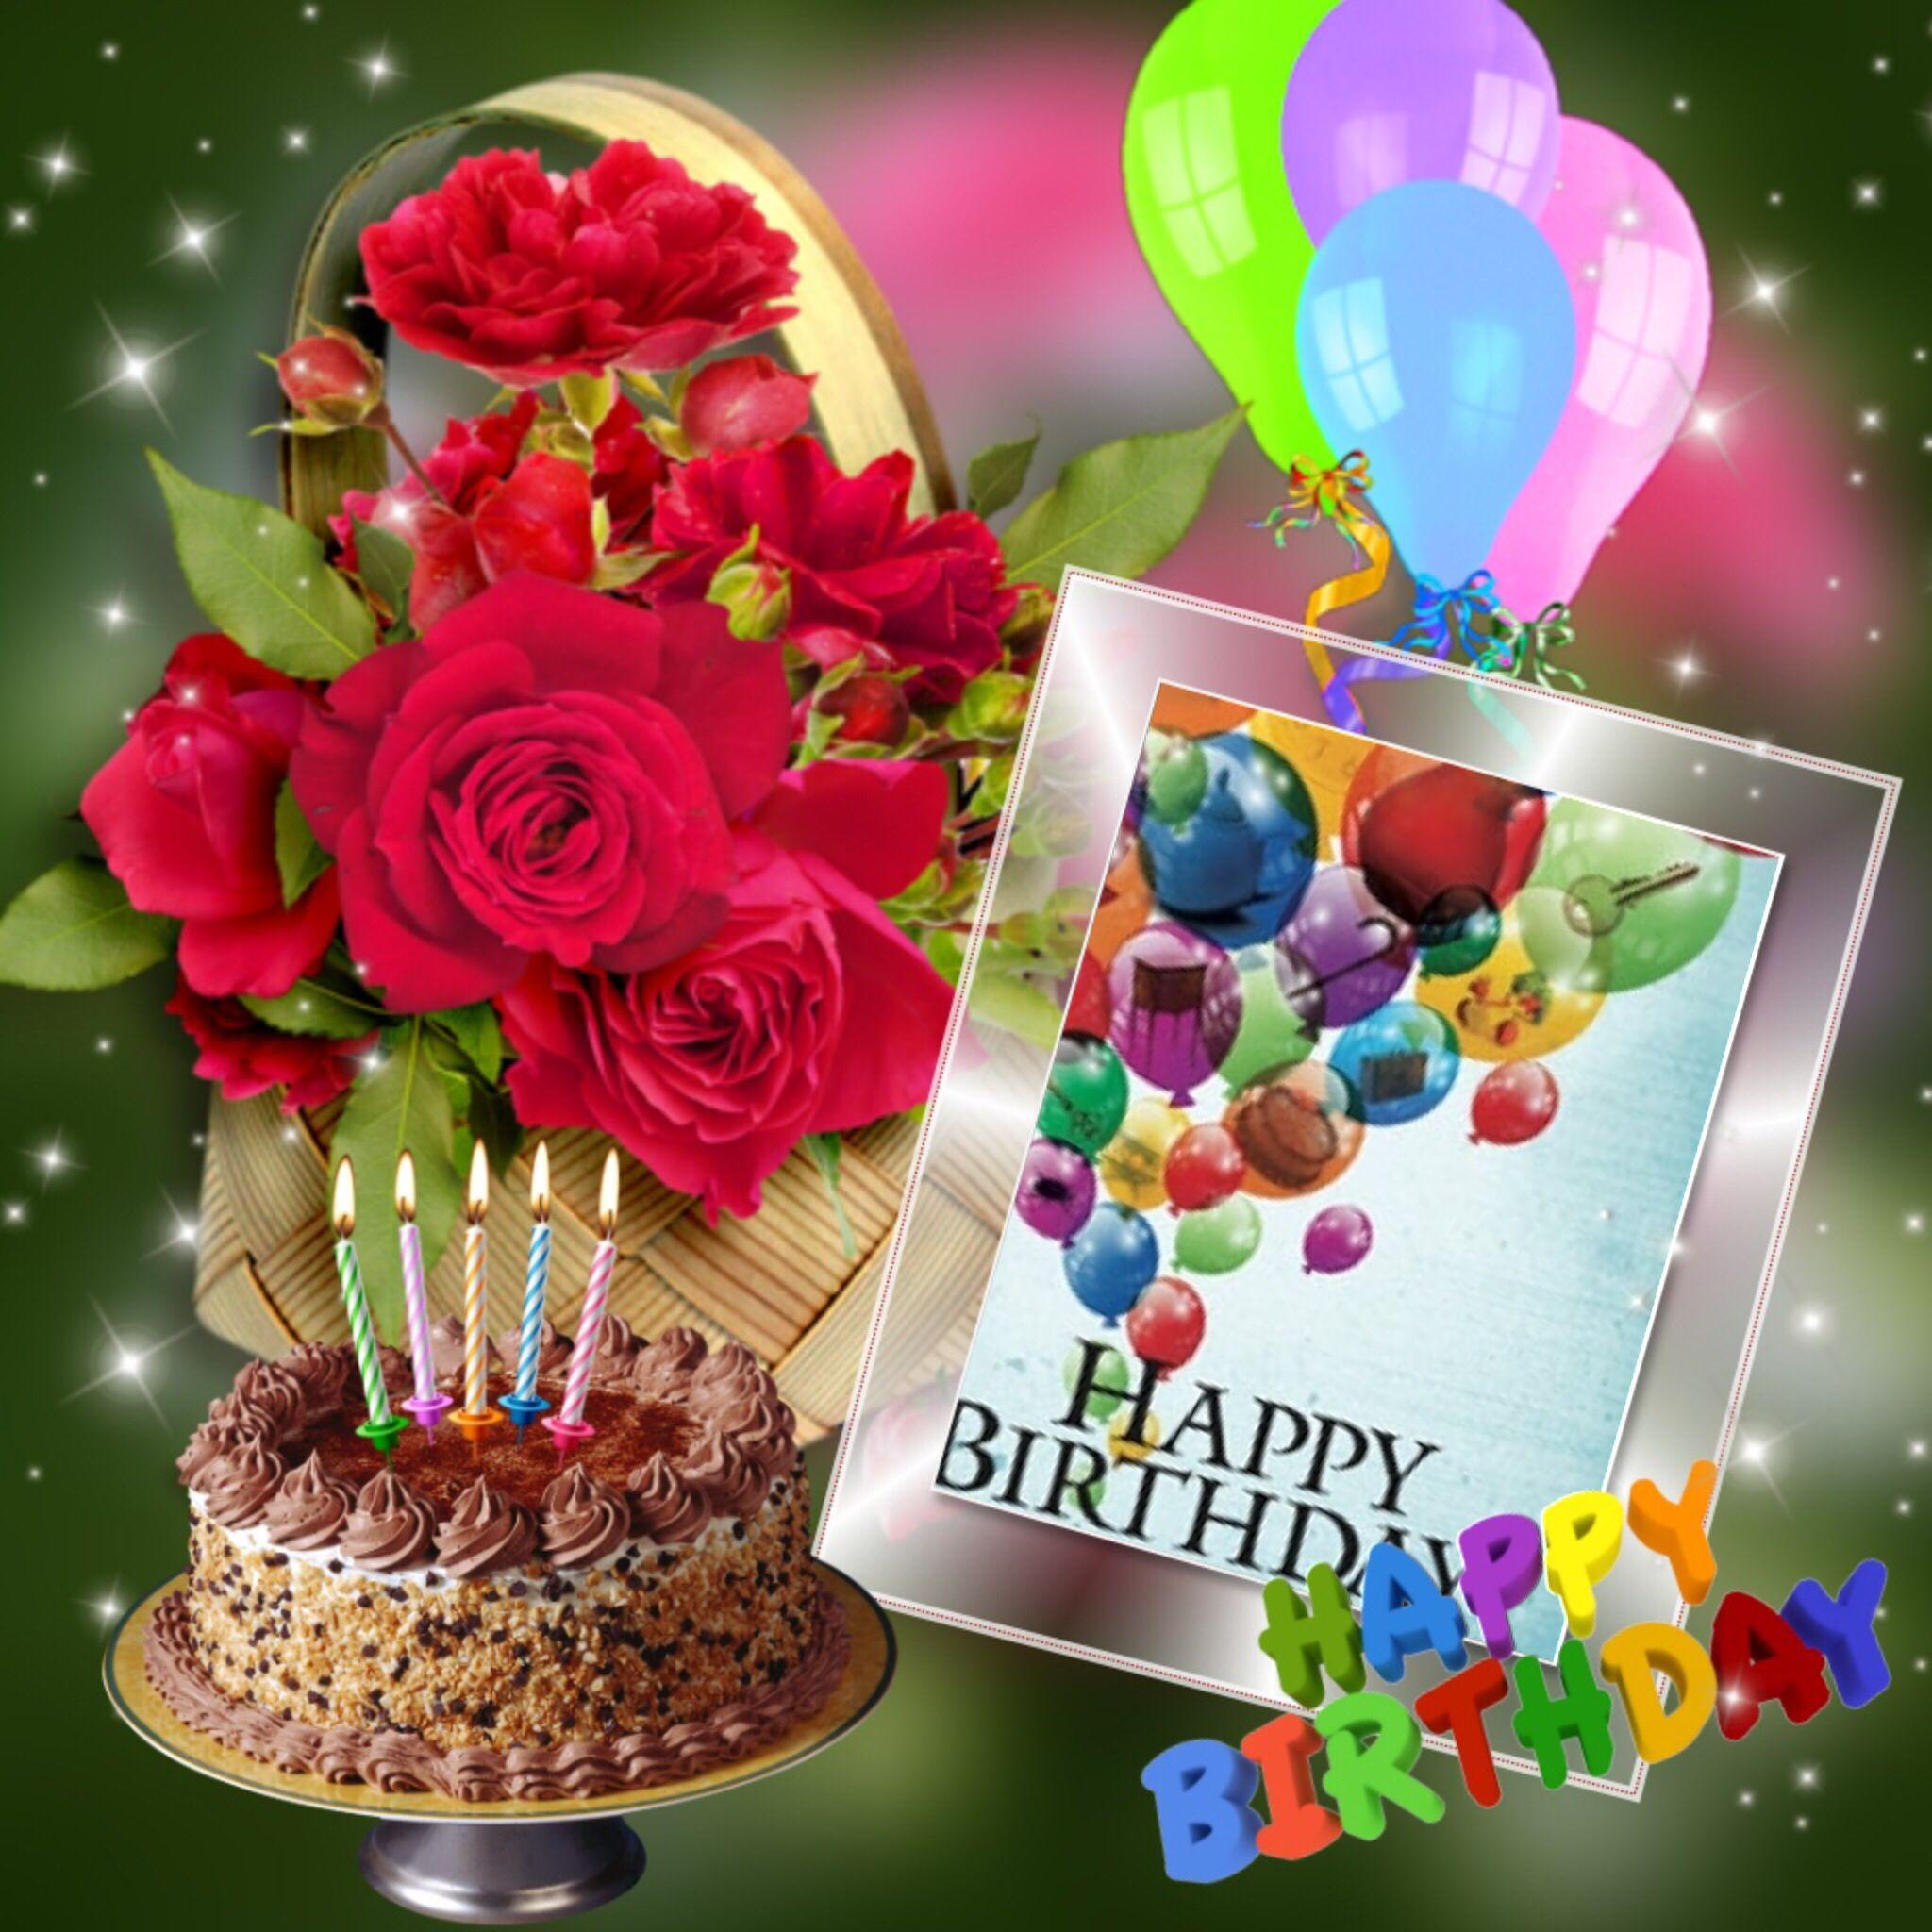 Happy Birthday Bonnie ❤ From Michelle ♥